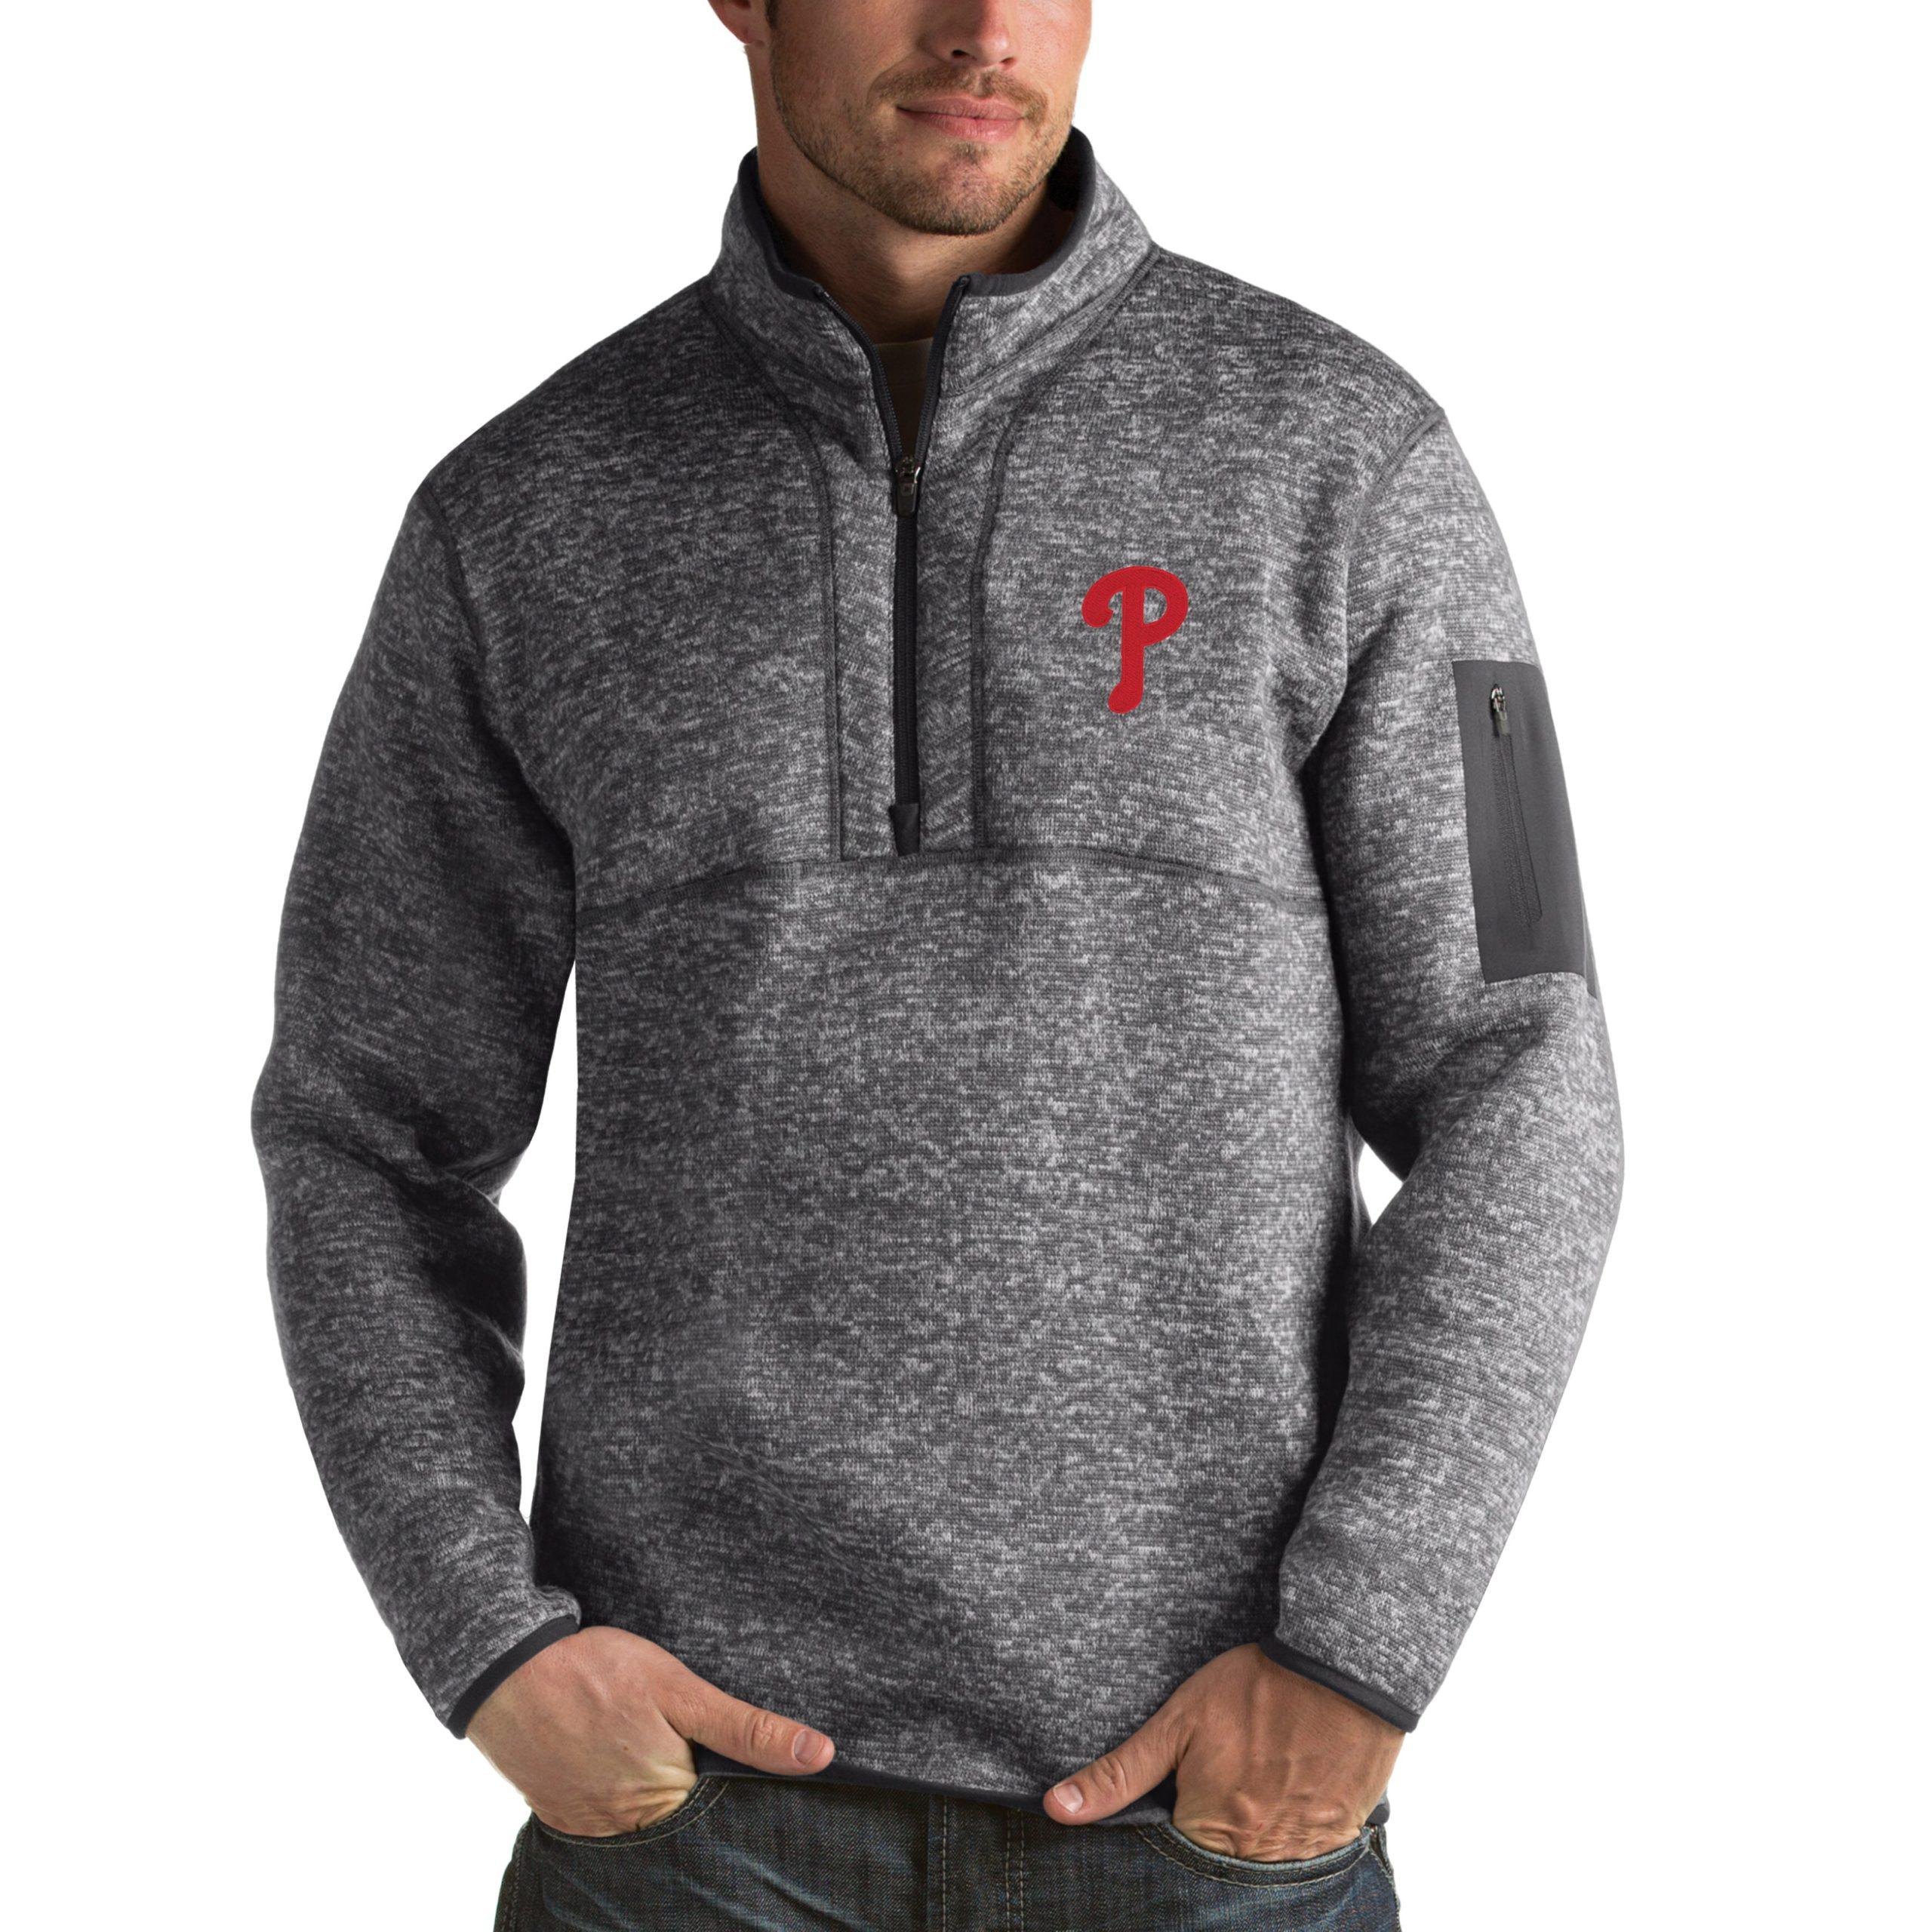 Philadelphia Phillies Antigua Fortune Half-Zip Sweater - Heathered Charcoal